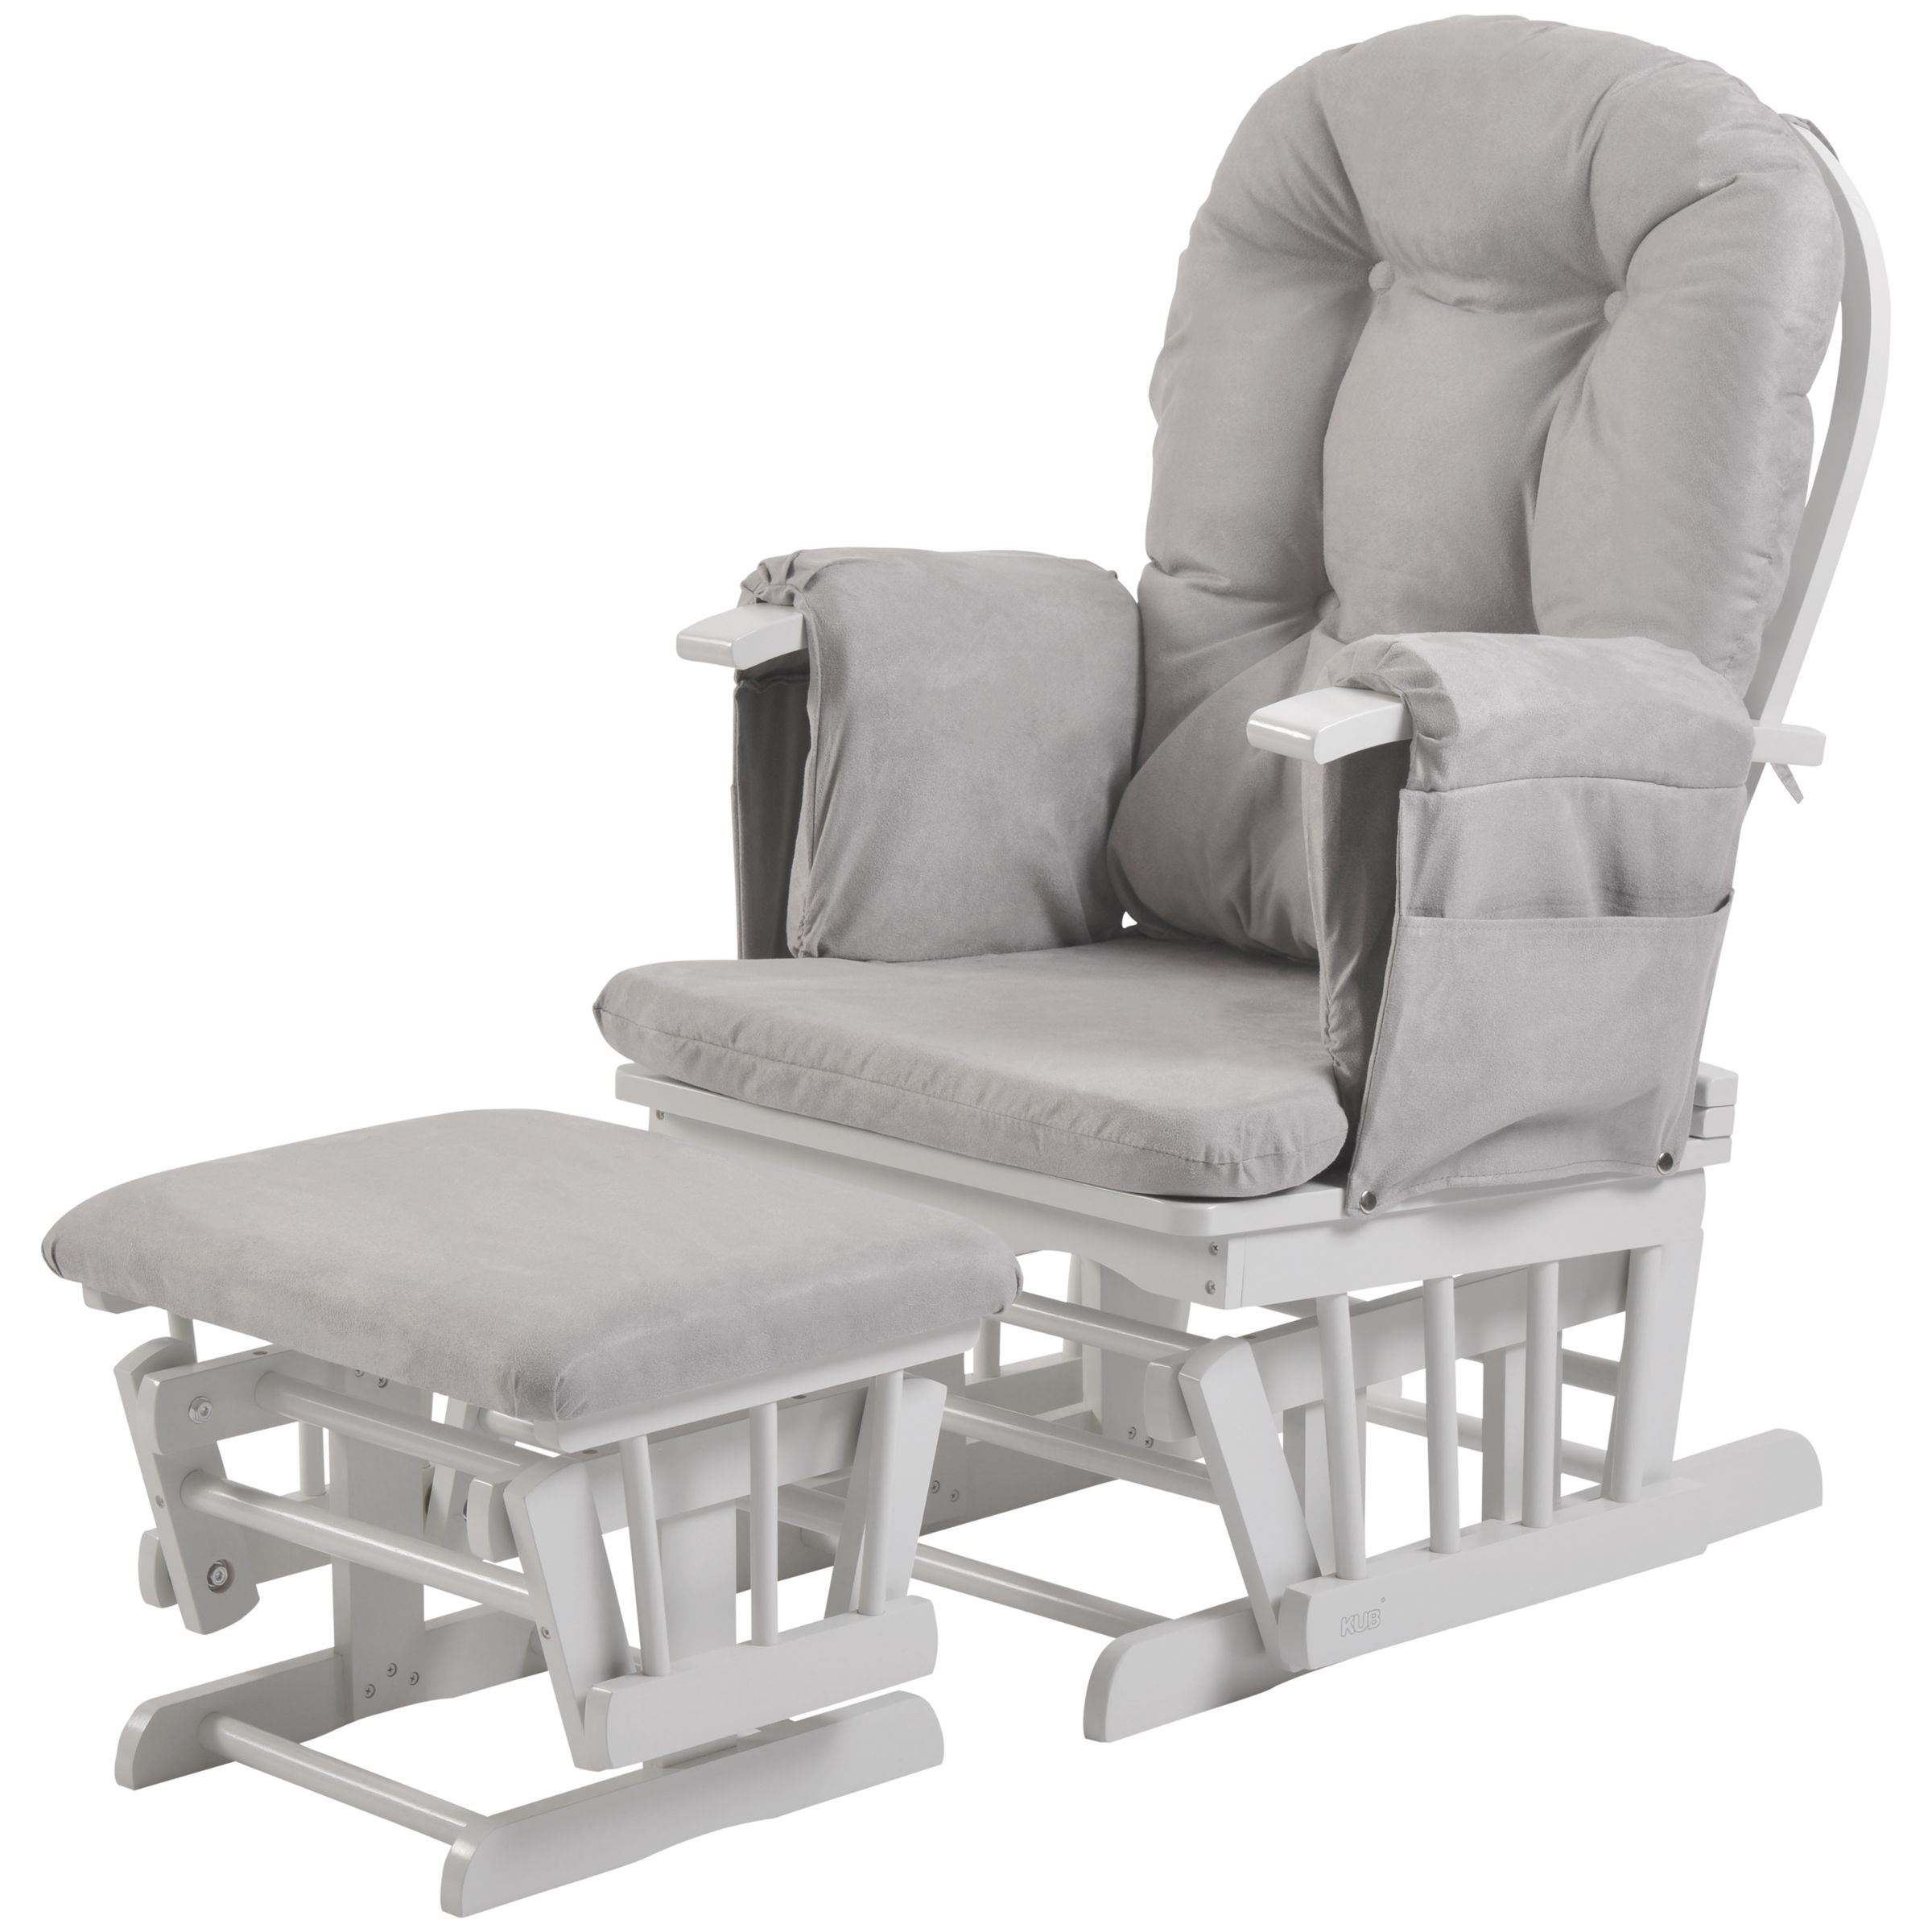 Kub Kub Haywood Reclining Glider Nursing Chair and Footstool, Grey